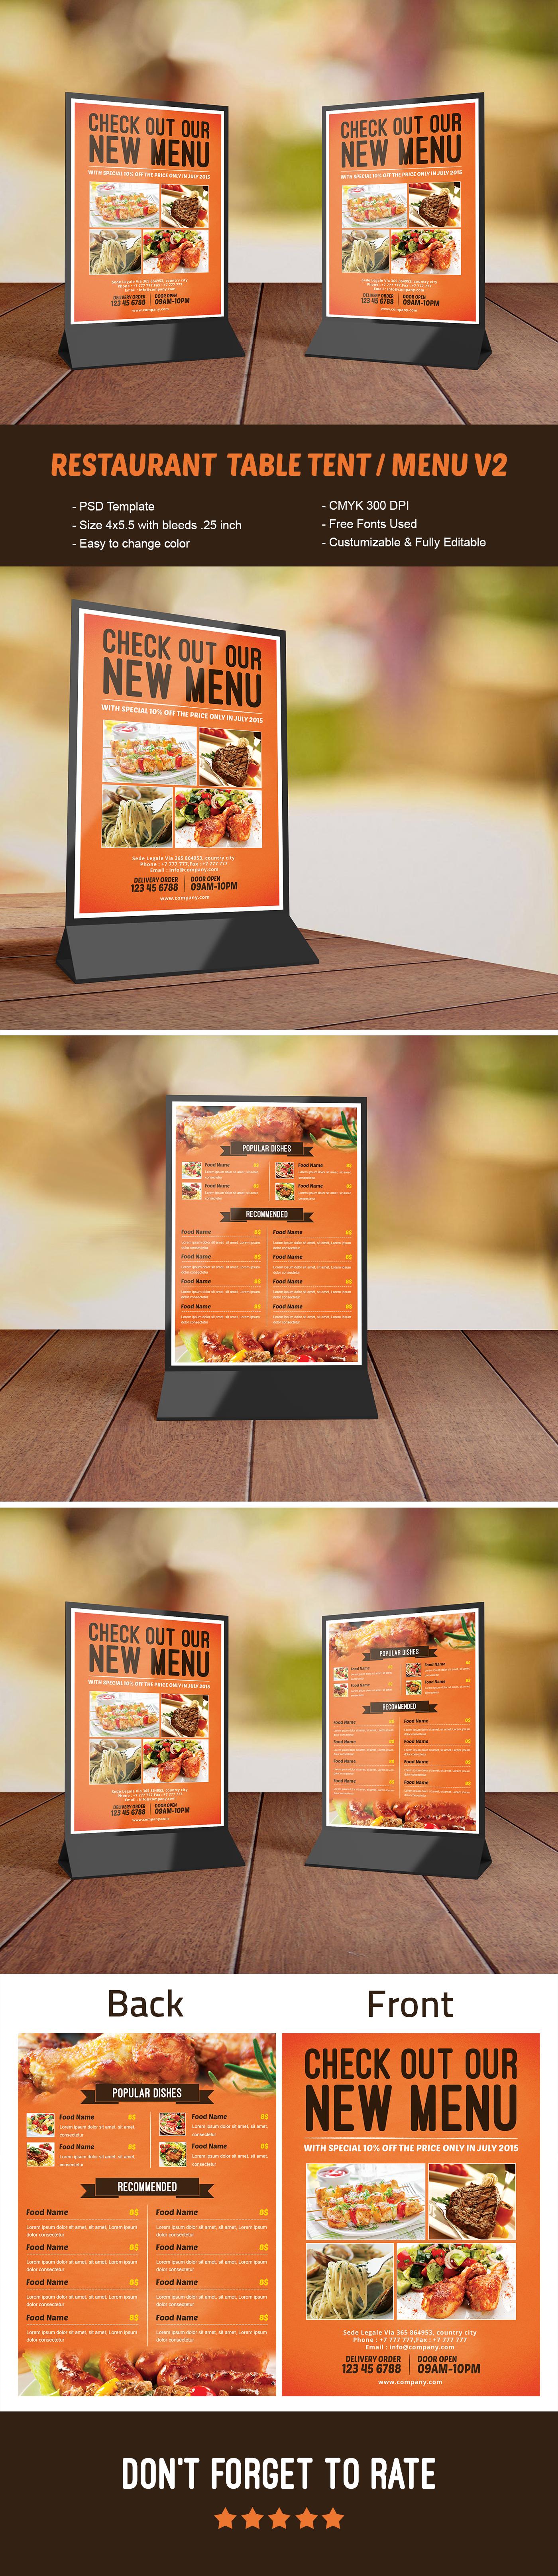 Restaurant Table Tent Menu V2 Template On Behance